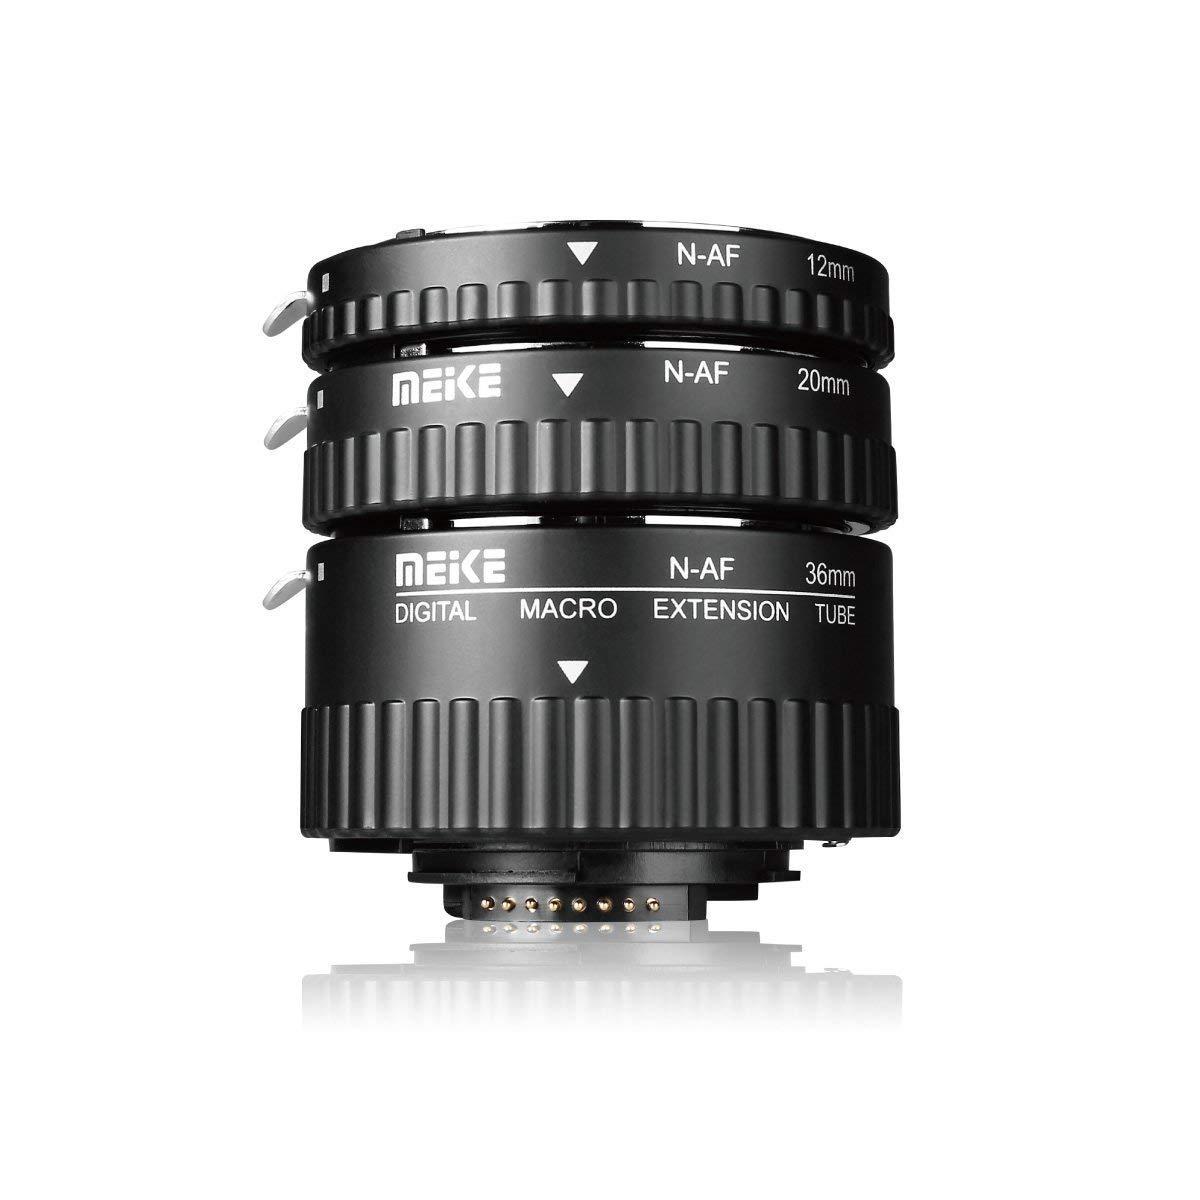 Meike MK-N-AF1-A Macro Electronic Mount Auto Foucs Macro Metal Extension Tube Adapter Nikon DSLR Camera D80 D90 D300 D300SD800 D3100 D3200 D5000 D51000 D5200 D7000 D7100 etc